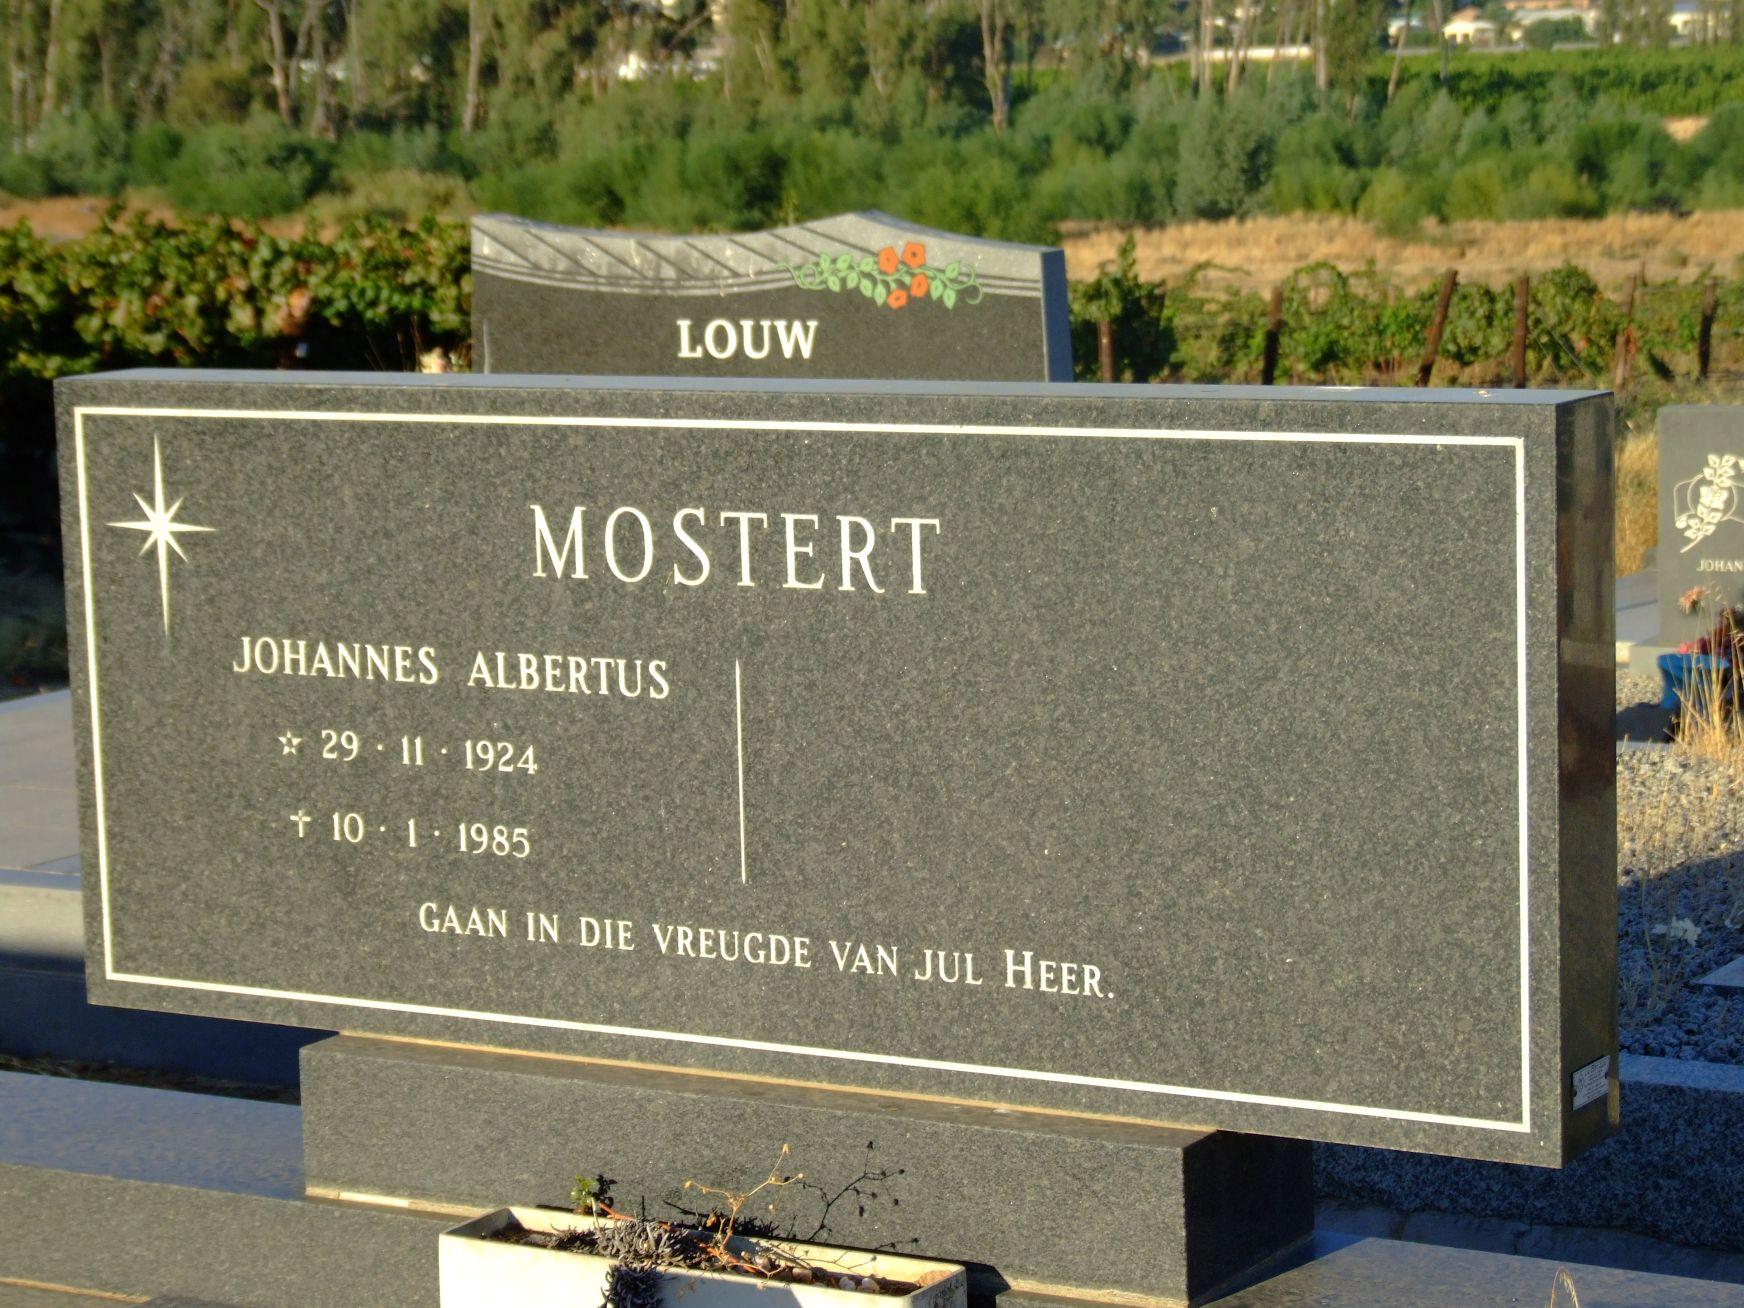 Mostert, Johannes Albertus